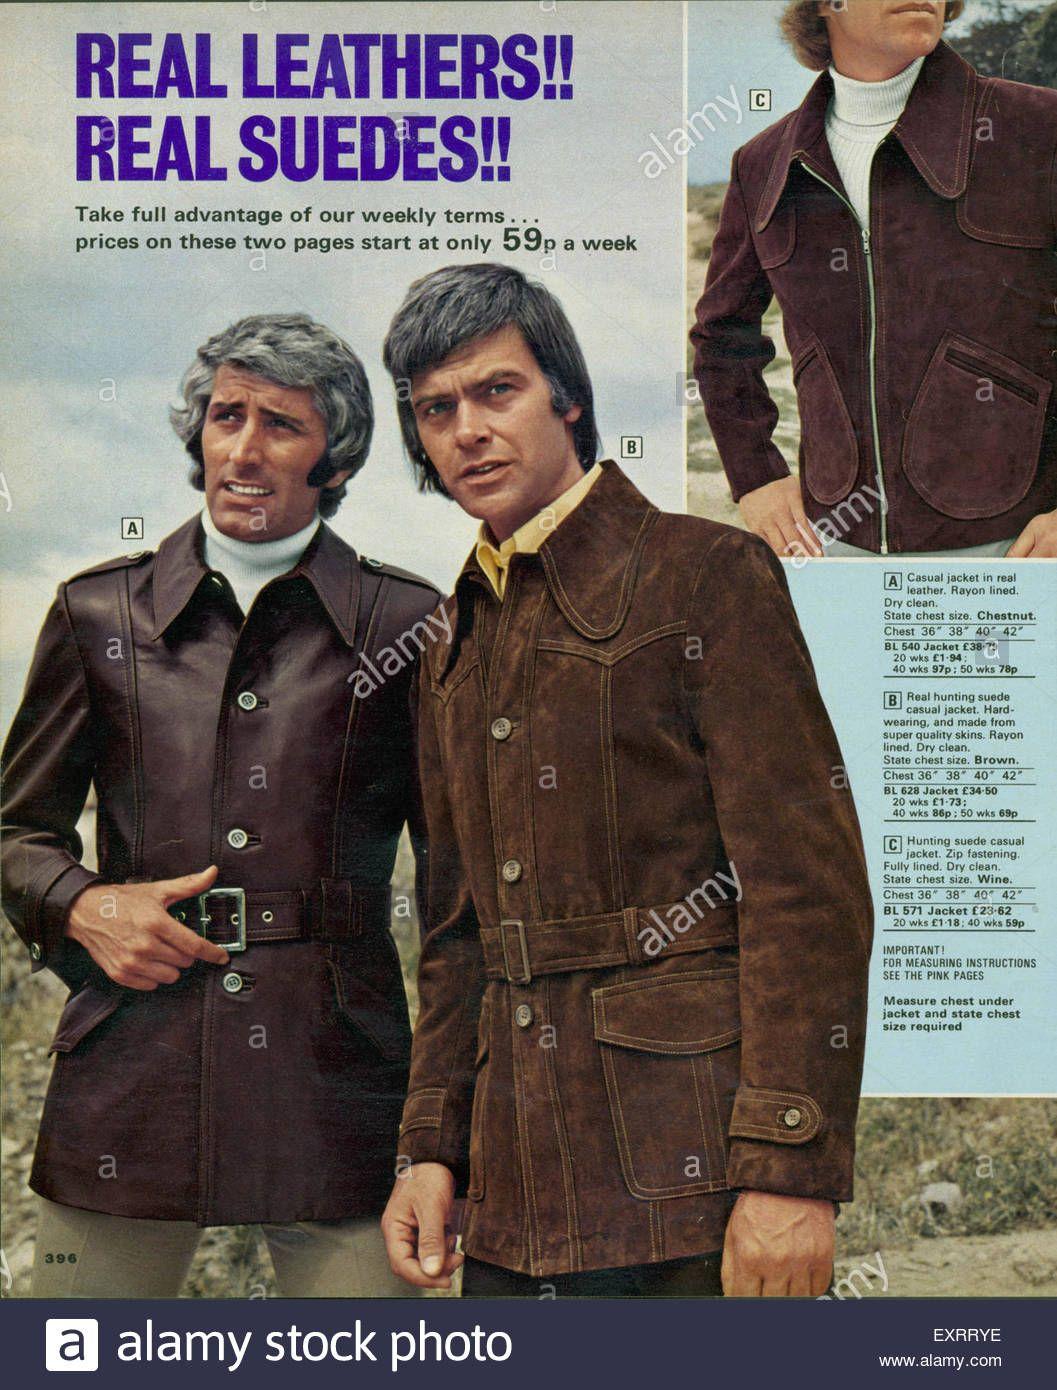 Resultado de imagen para coats 1970s fashion | 1970 hombre | Pinterest